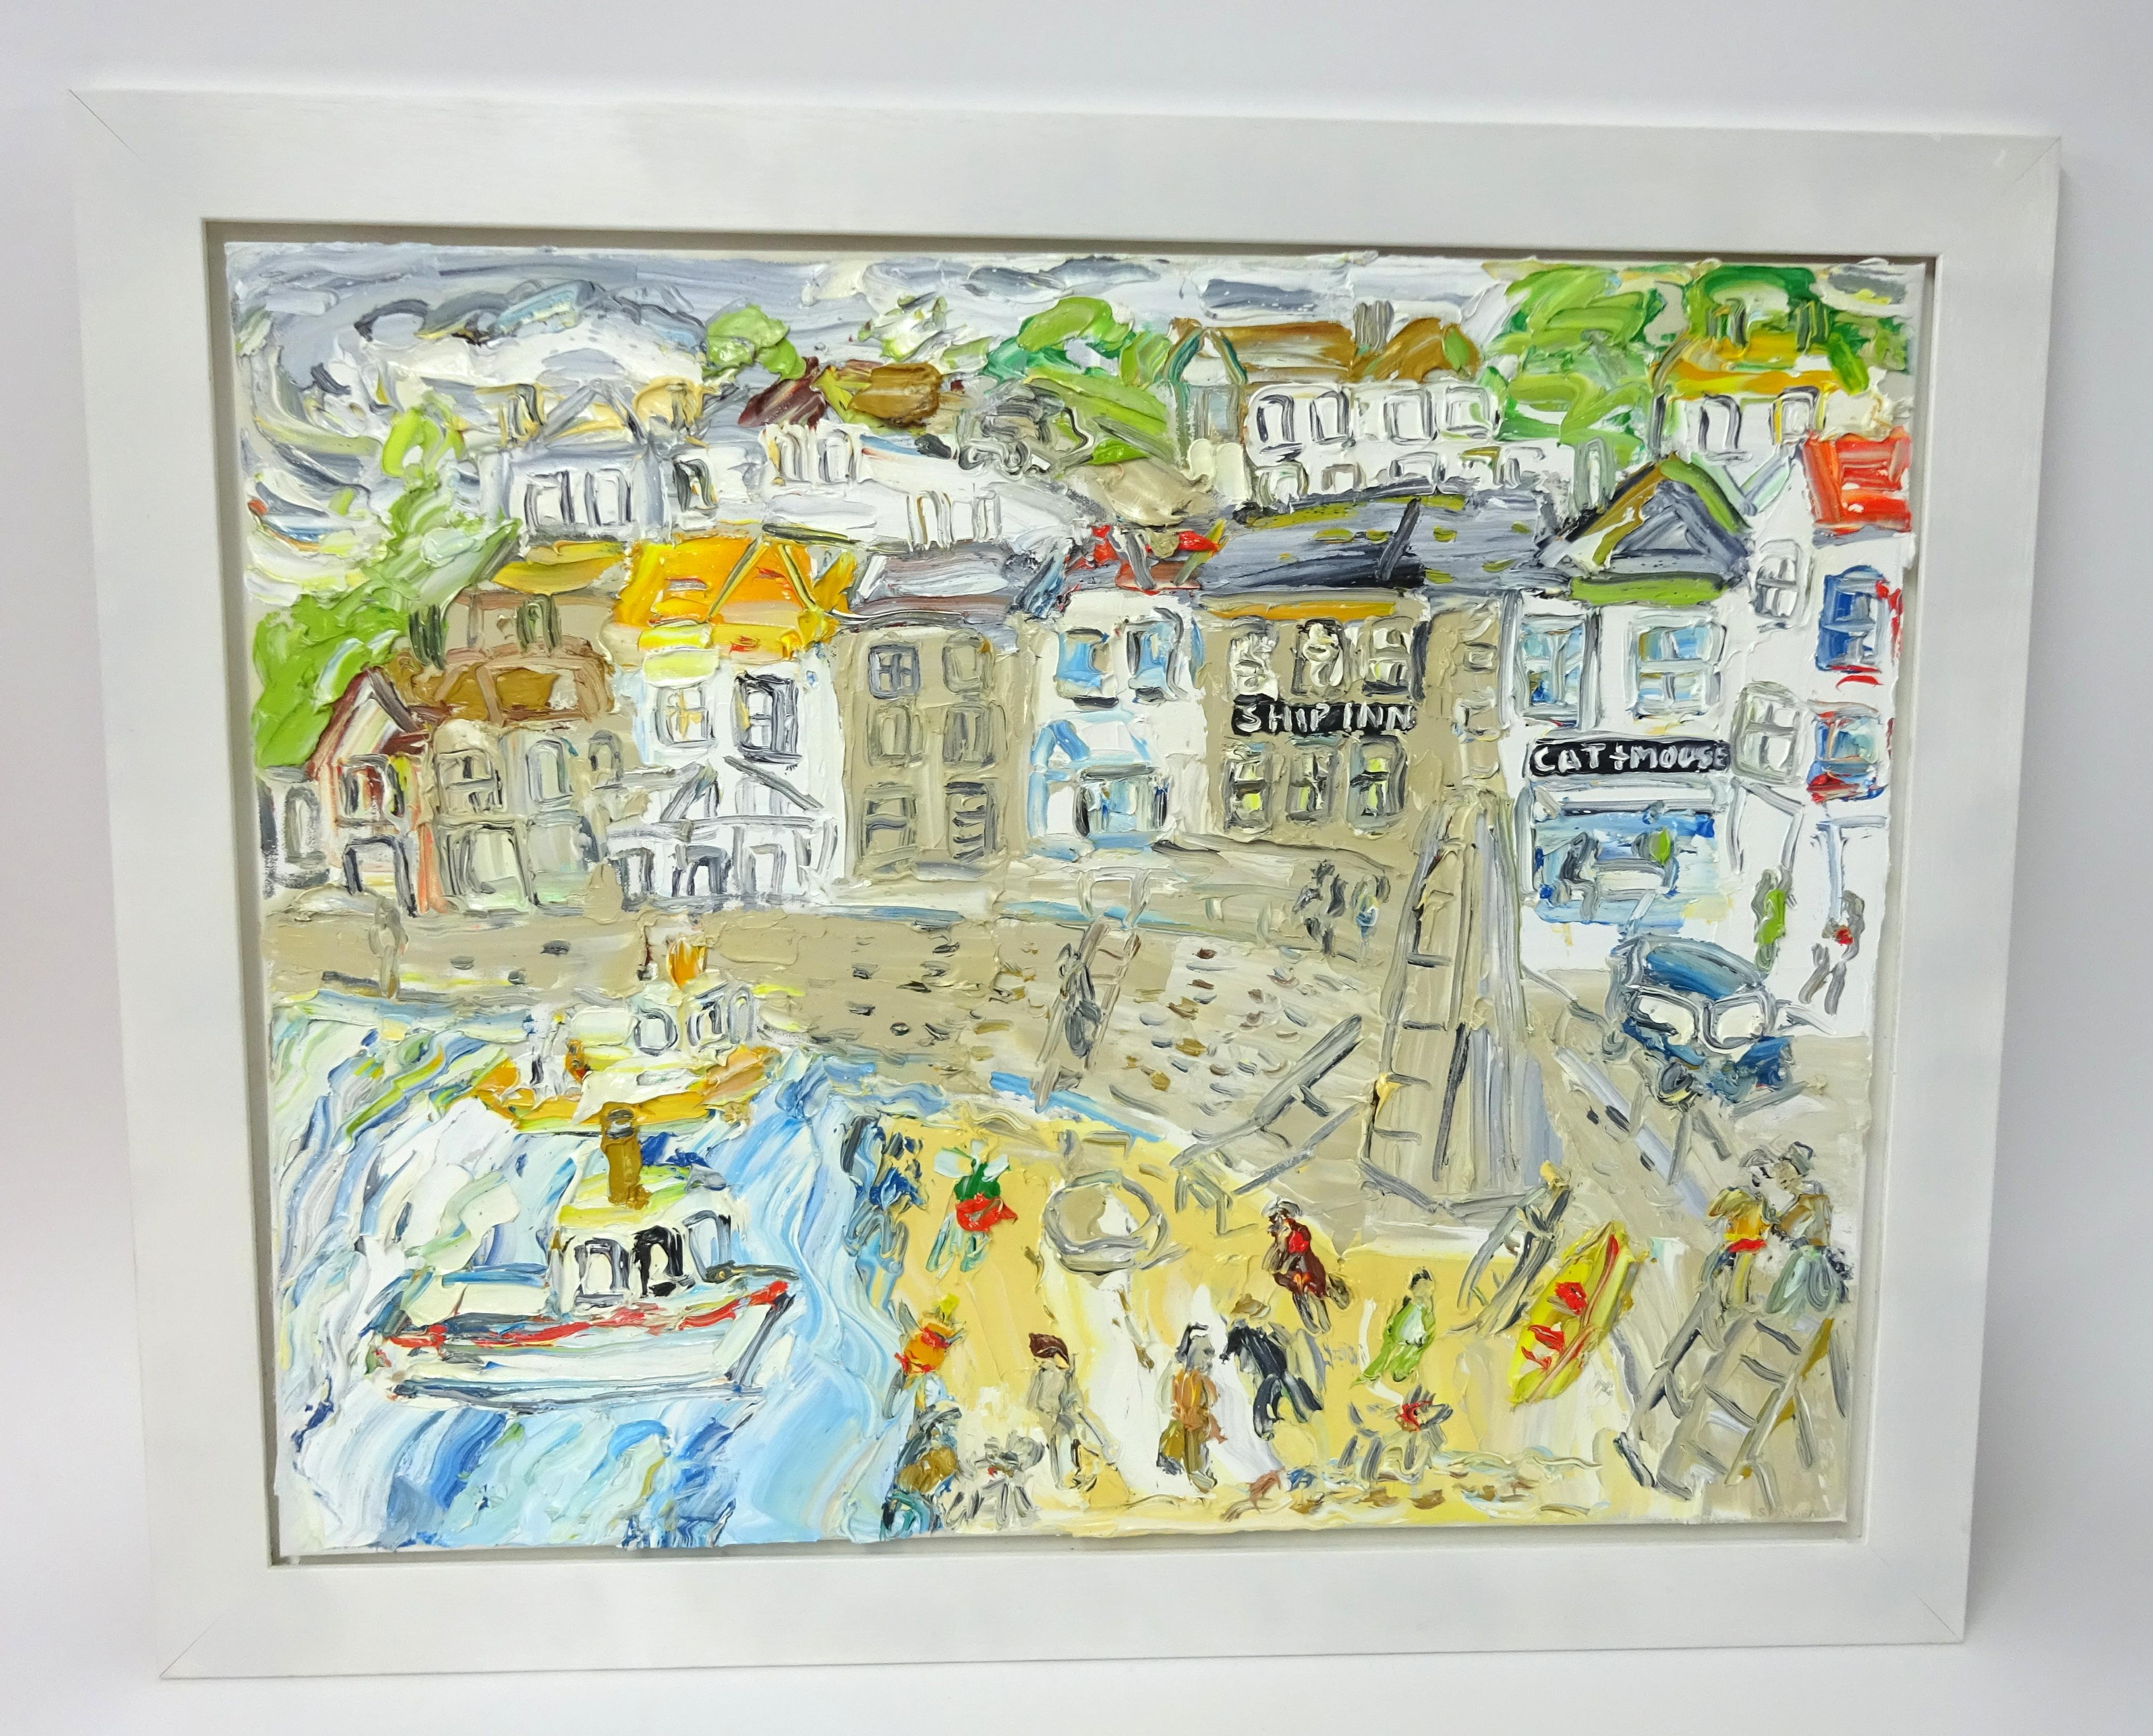 Lot 007 - Sean Hayden, oil on canvas 'Mousehole Harbour' (2017), signed in floating wood frame, 60cm x 77cm,